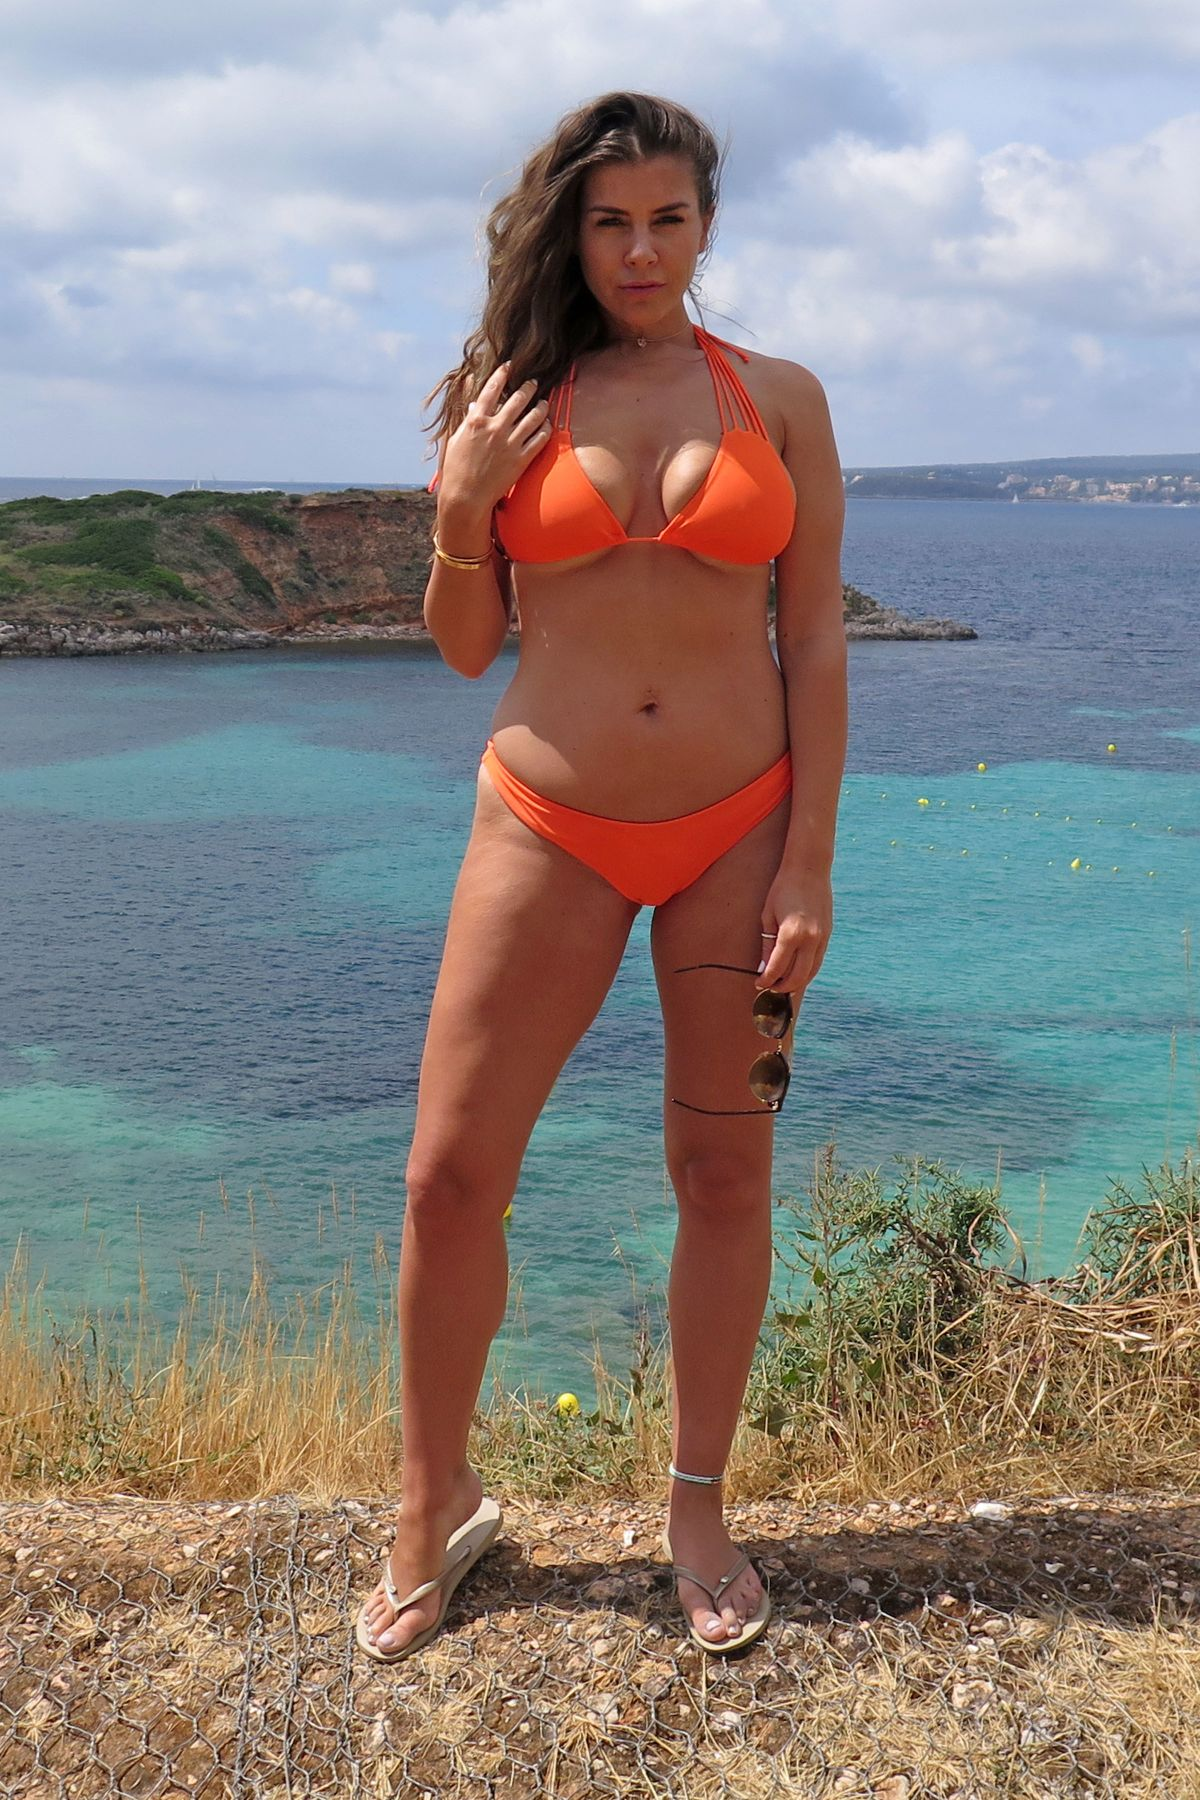 Shania twain in a bikini